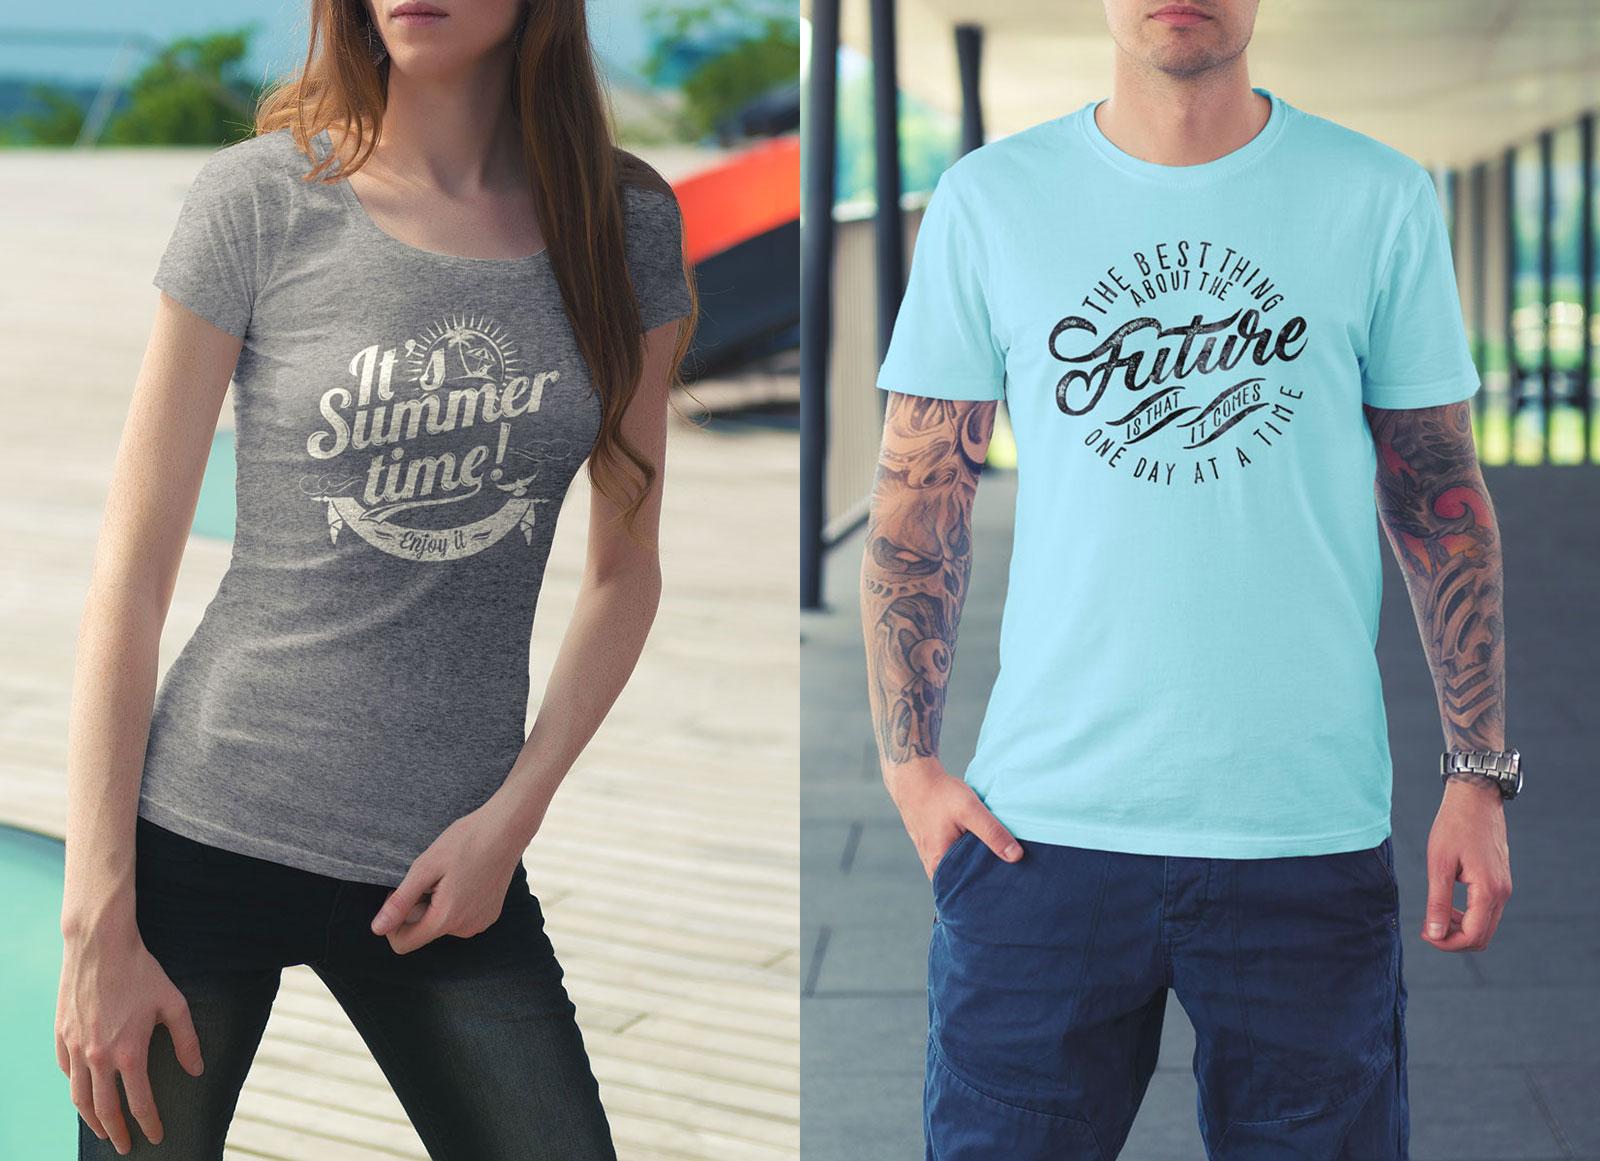 Free Male Female T Shirt Mockup Psd Files Good Mockups